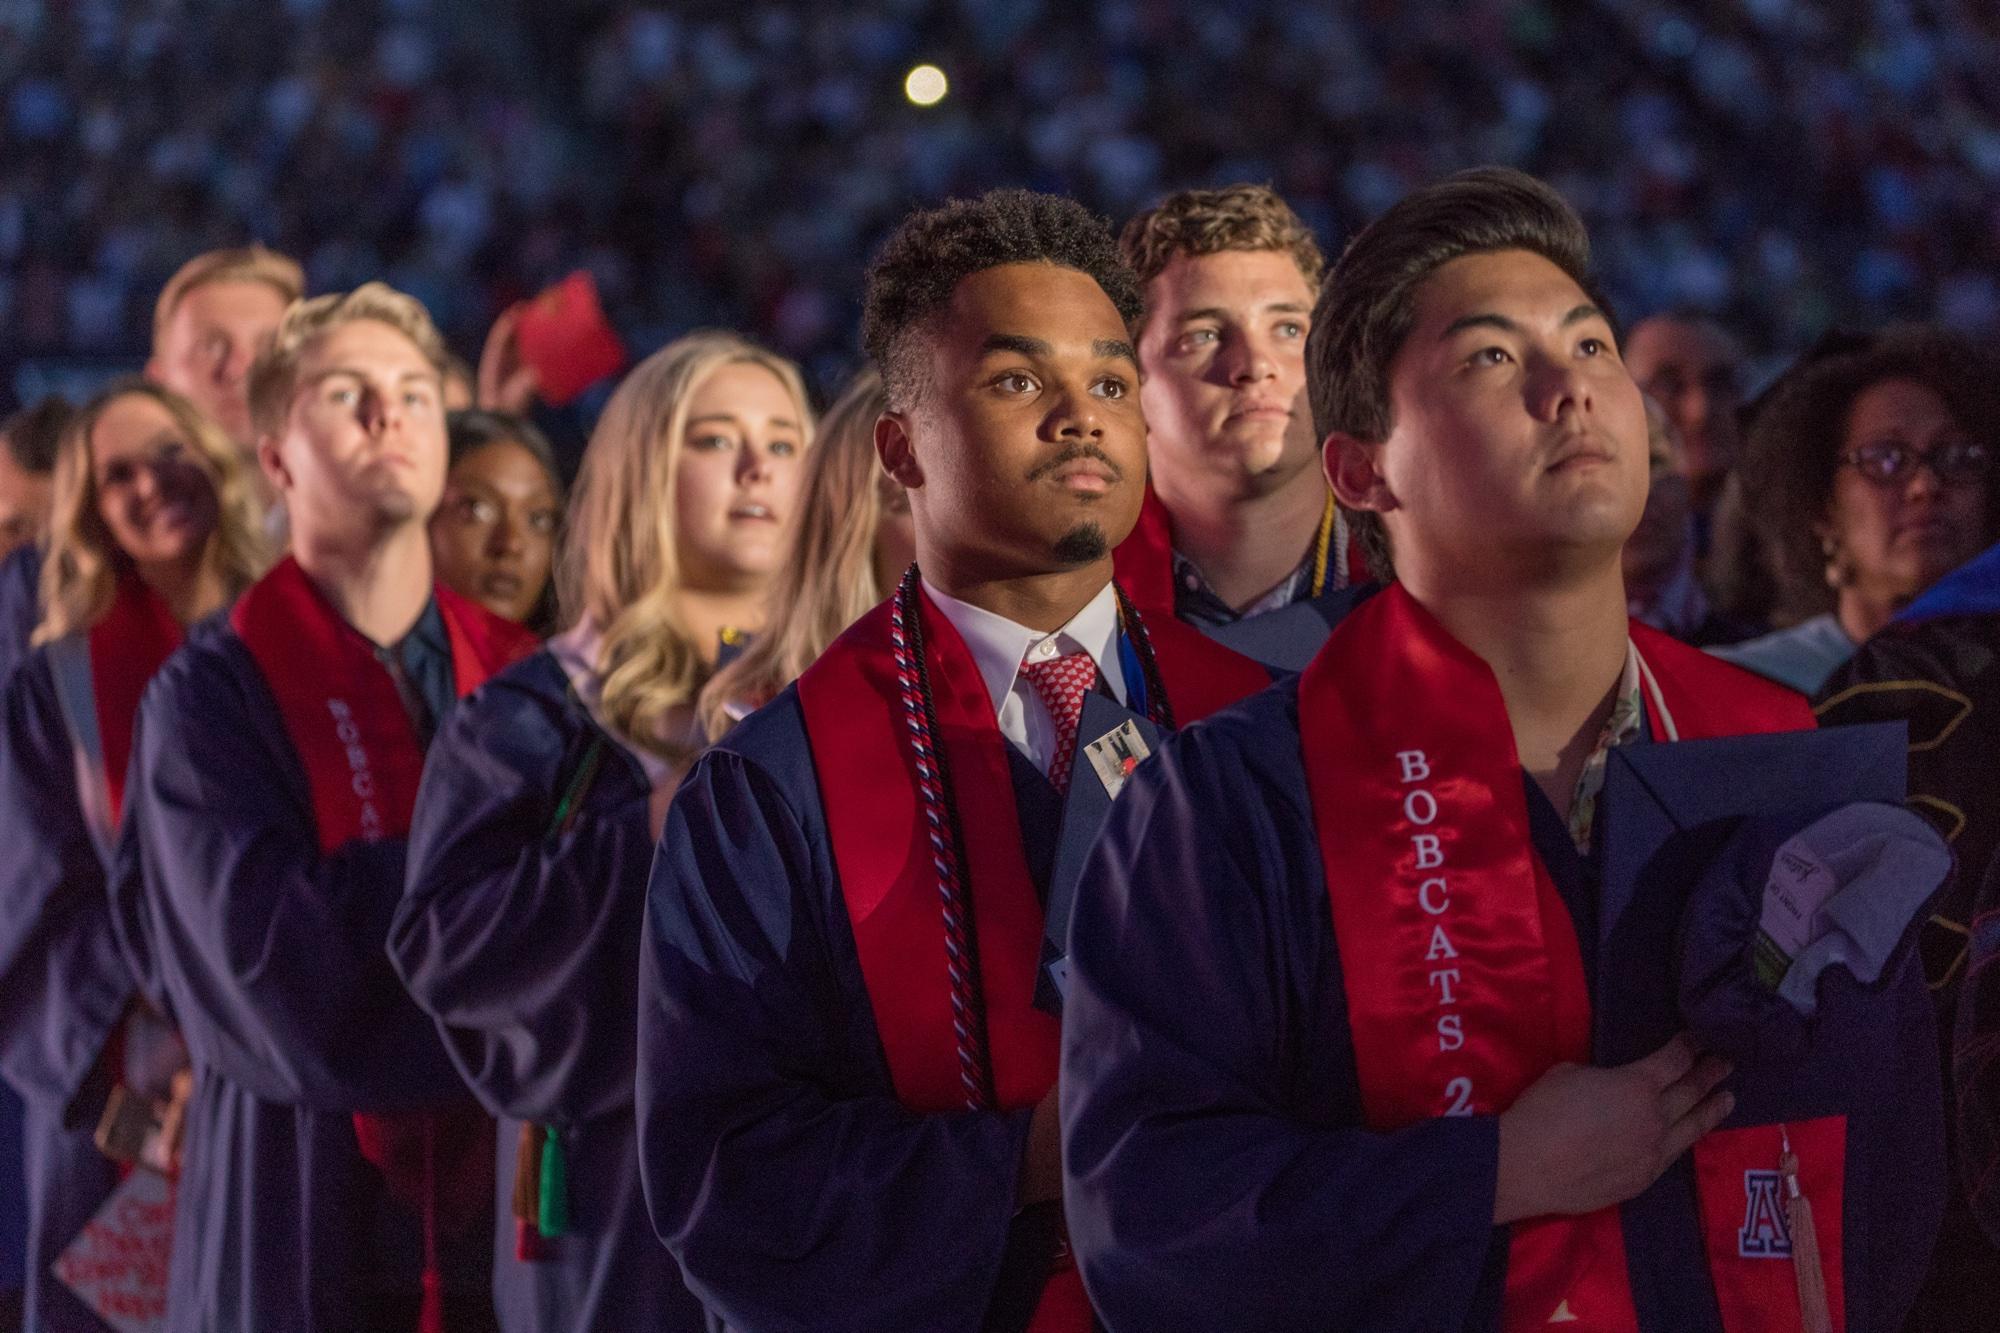 Photo: Chris Richards/UA Alumni Association